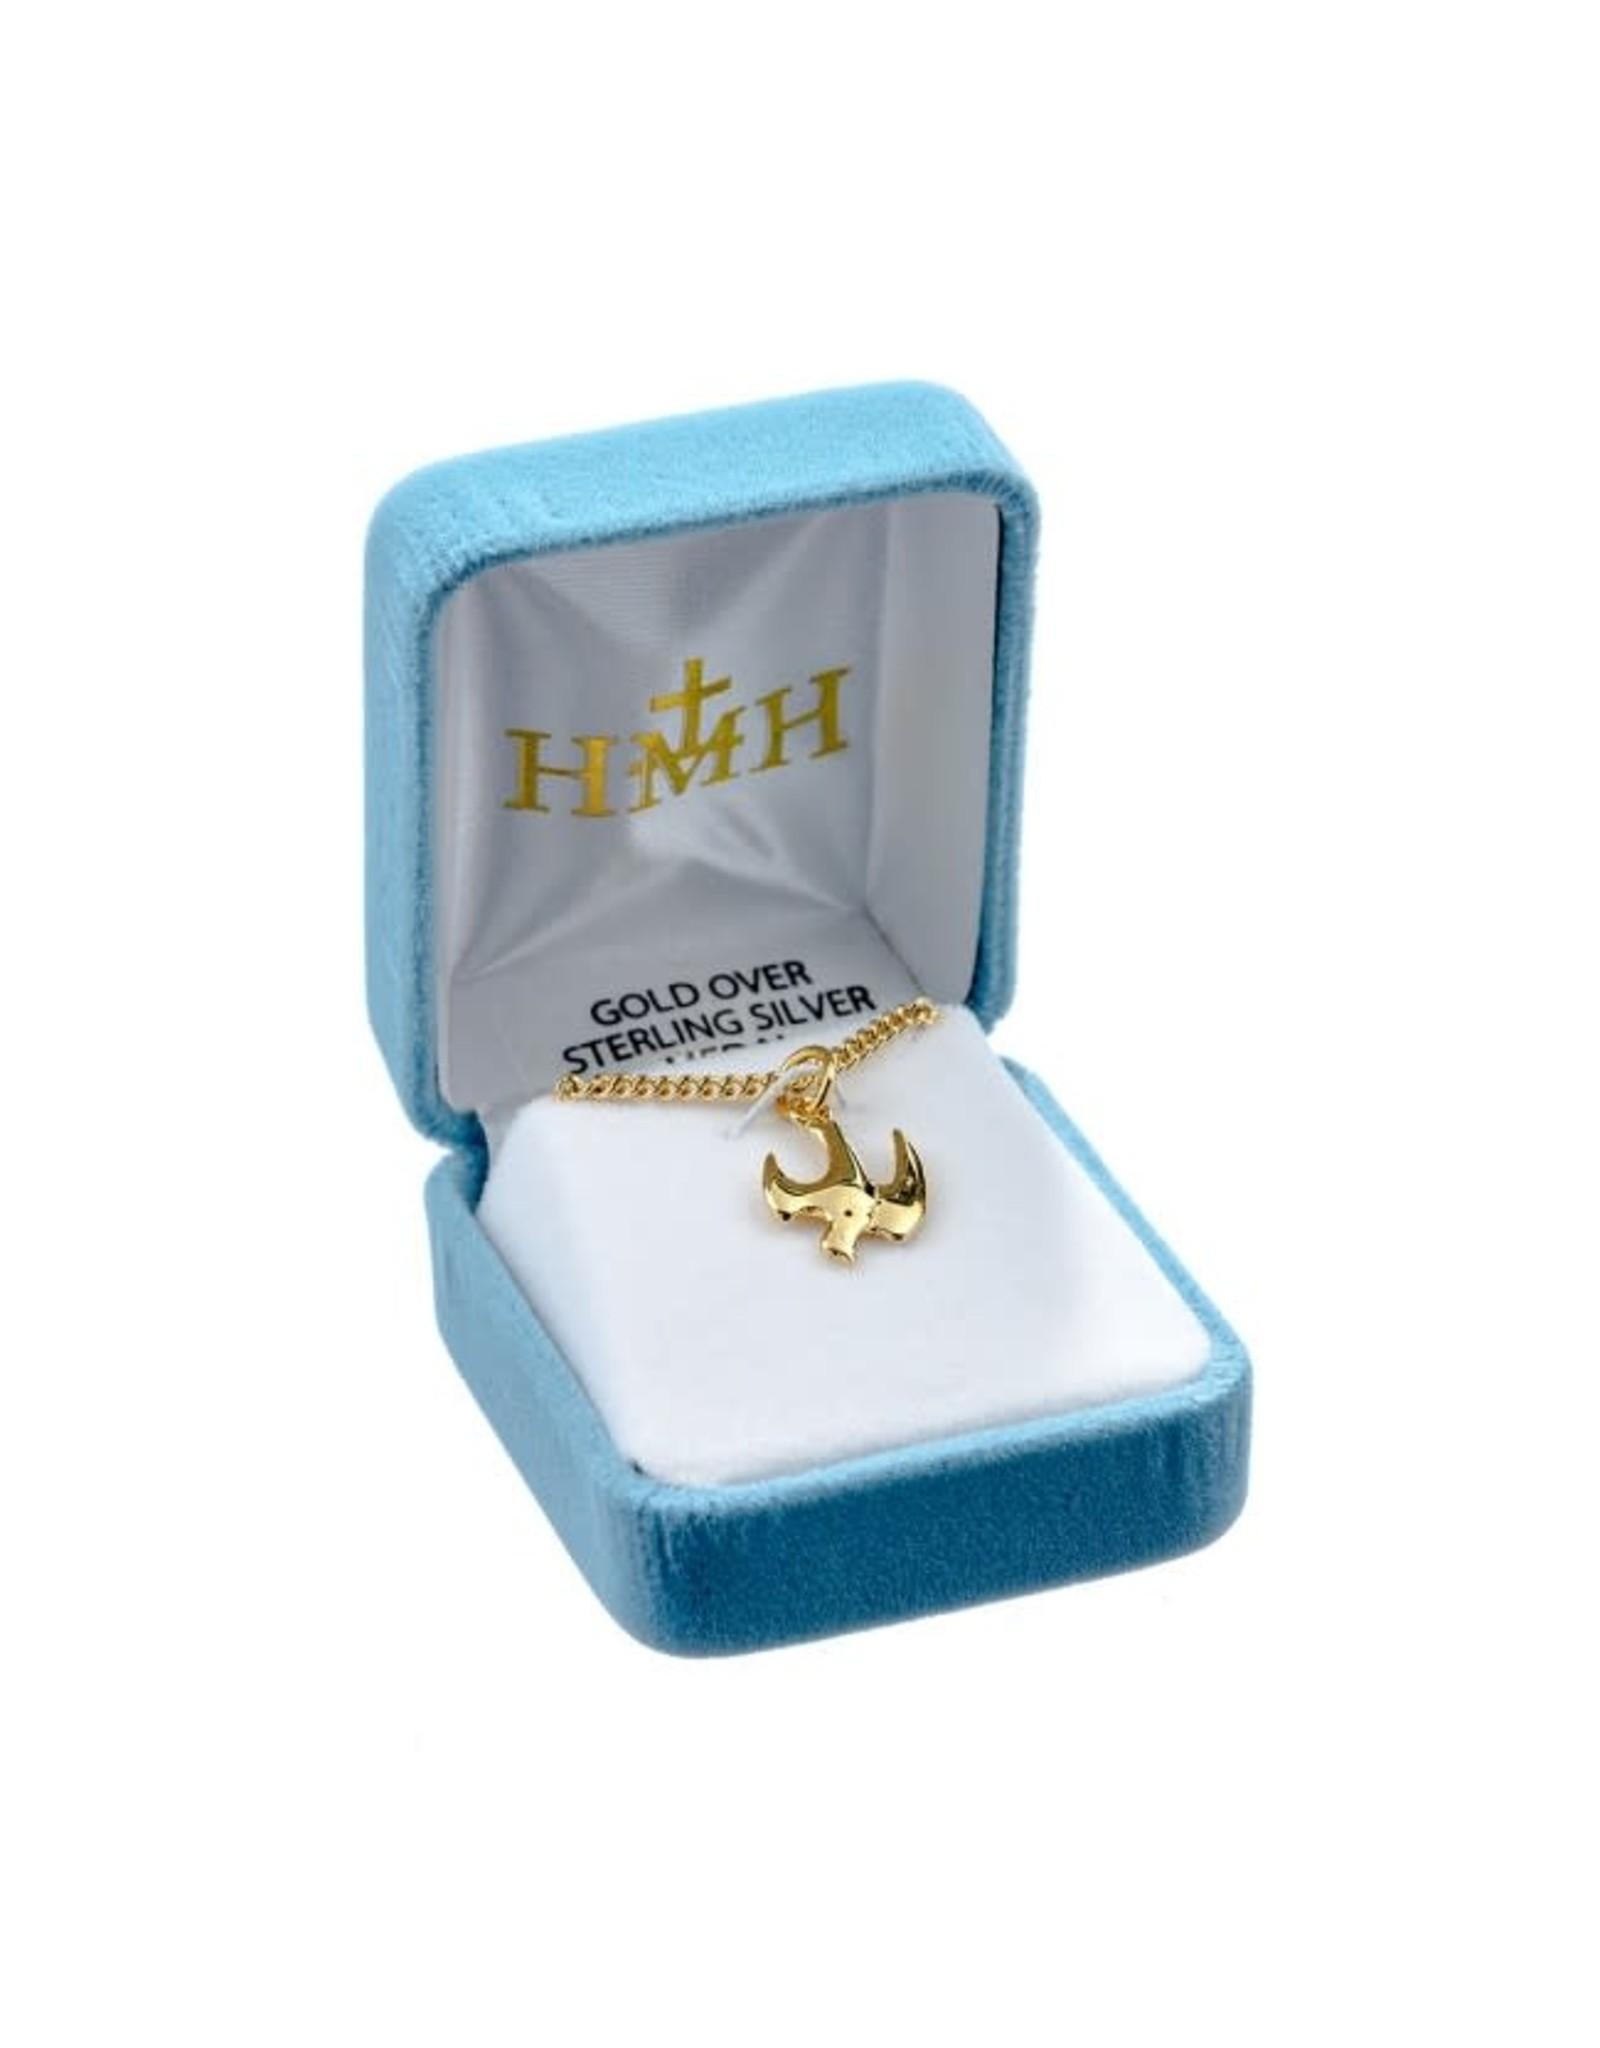 "HMH 16 Karat Gold Over Sterling Silver Medal Descending Dove on 18"" Chain, Boxed"